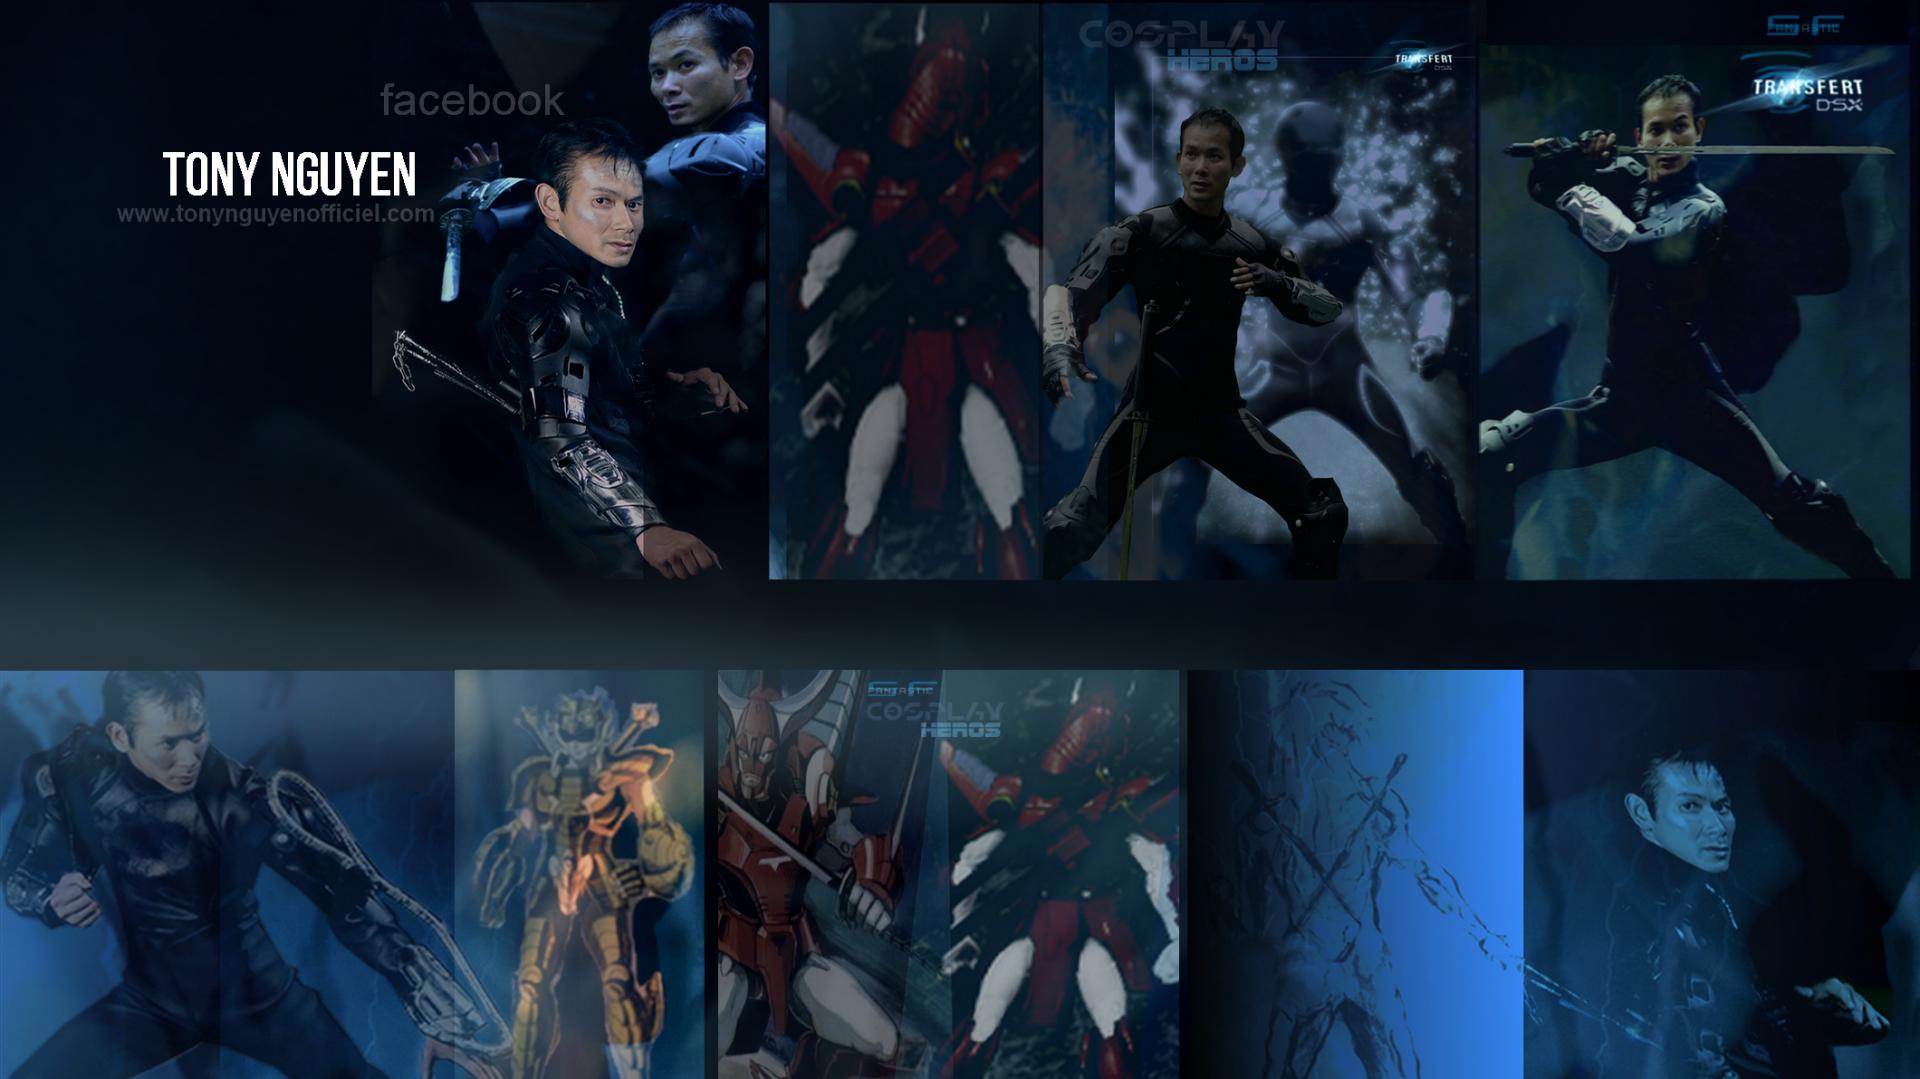 Facebook tonynguyen dsxtransfert cosplayherosarmuressf